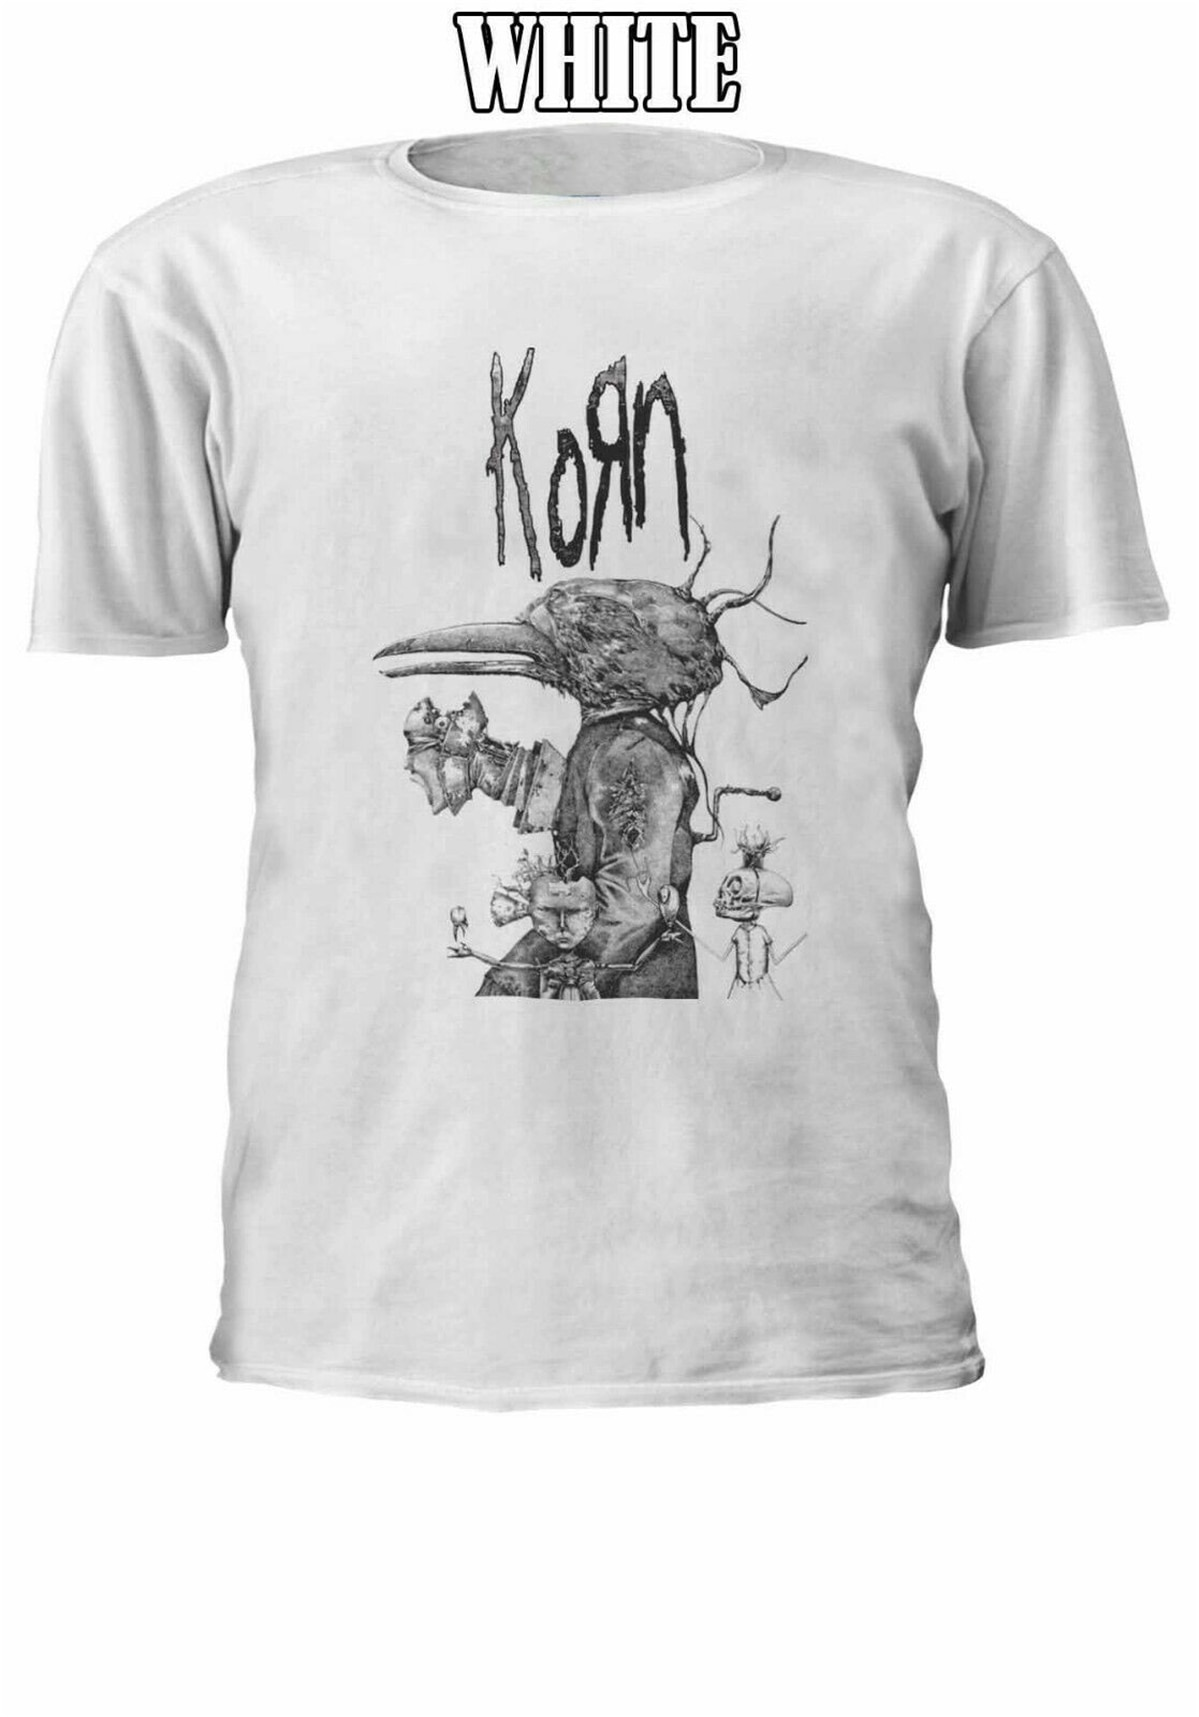 KORN NU HEAVY METAL hombres mujeres Unisex camiseta chaleco béisbol Hoodie 2679 nuevo Unisex divertido Tops camiseta